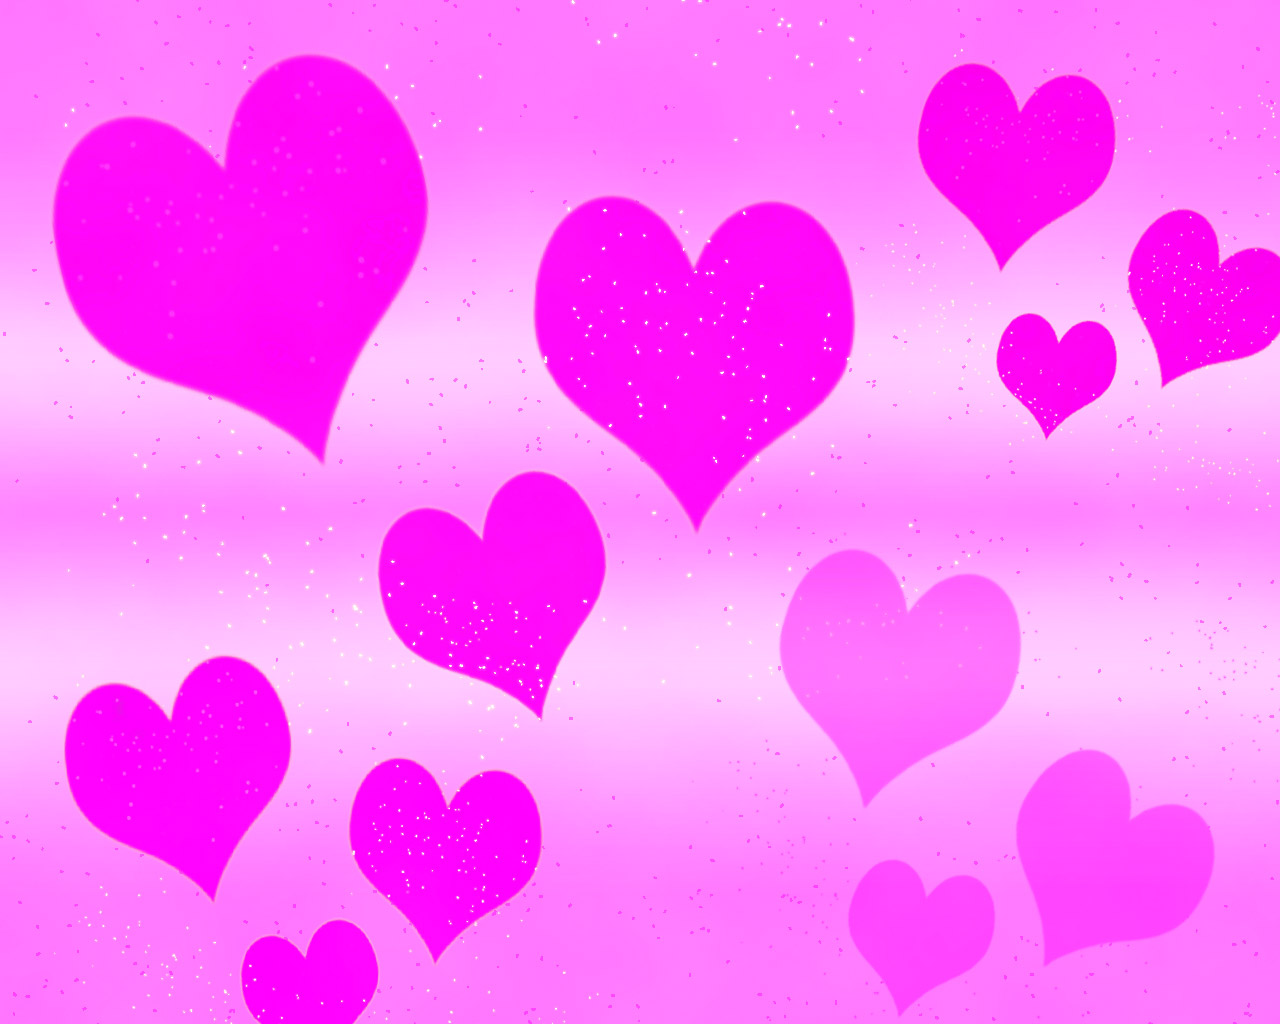 Cute Love Heart Wallpaper: Download Free Wallpapers: Emo Heart Wallpapers